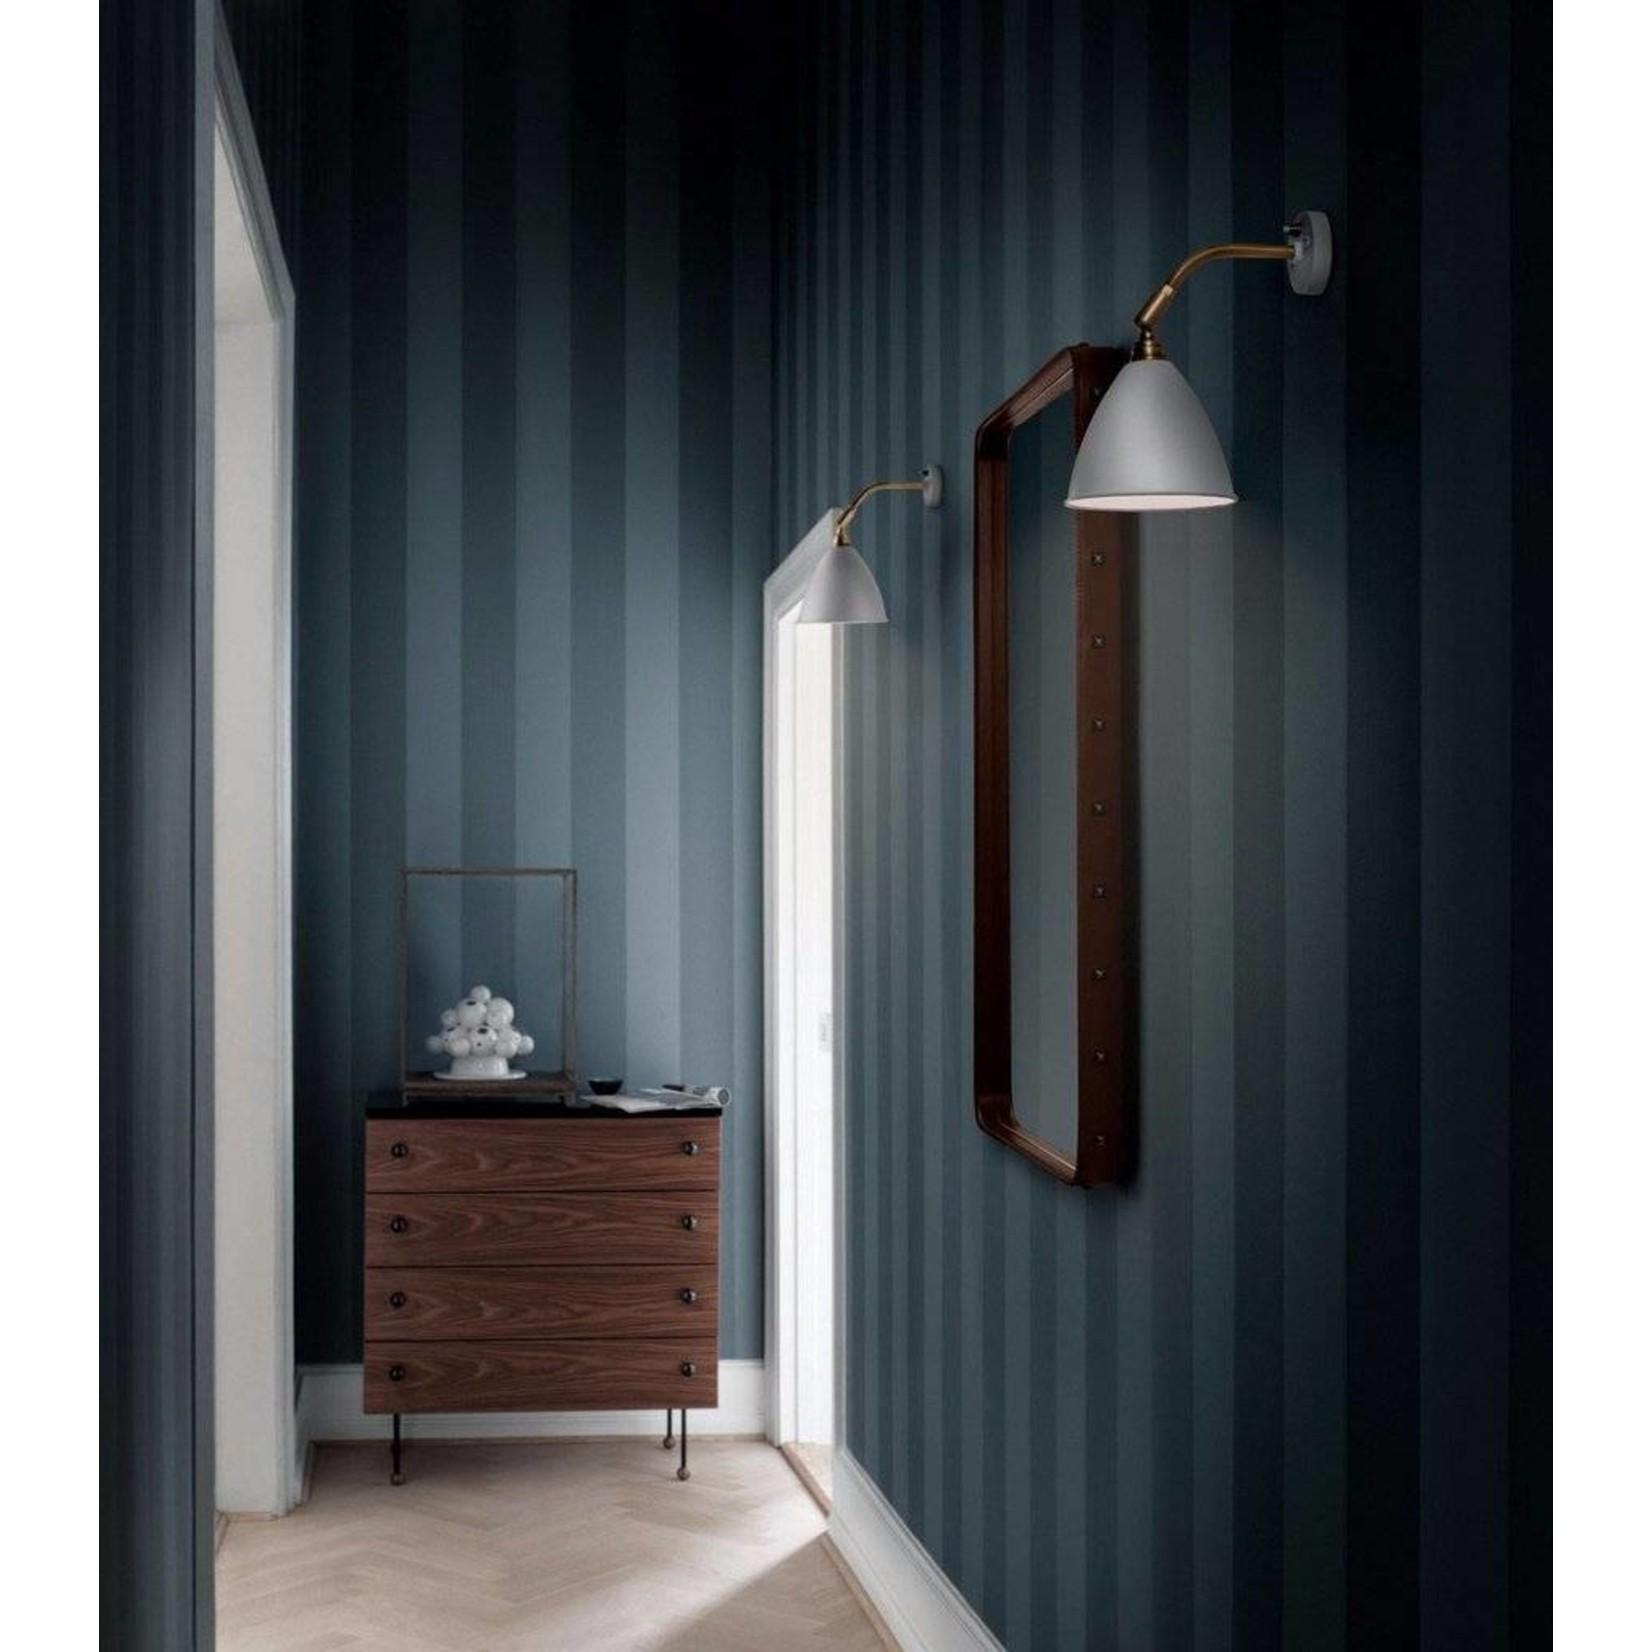 Gubi Wall mirror Adnet - Rectangular - 65x115 - Tan Leather